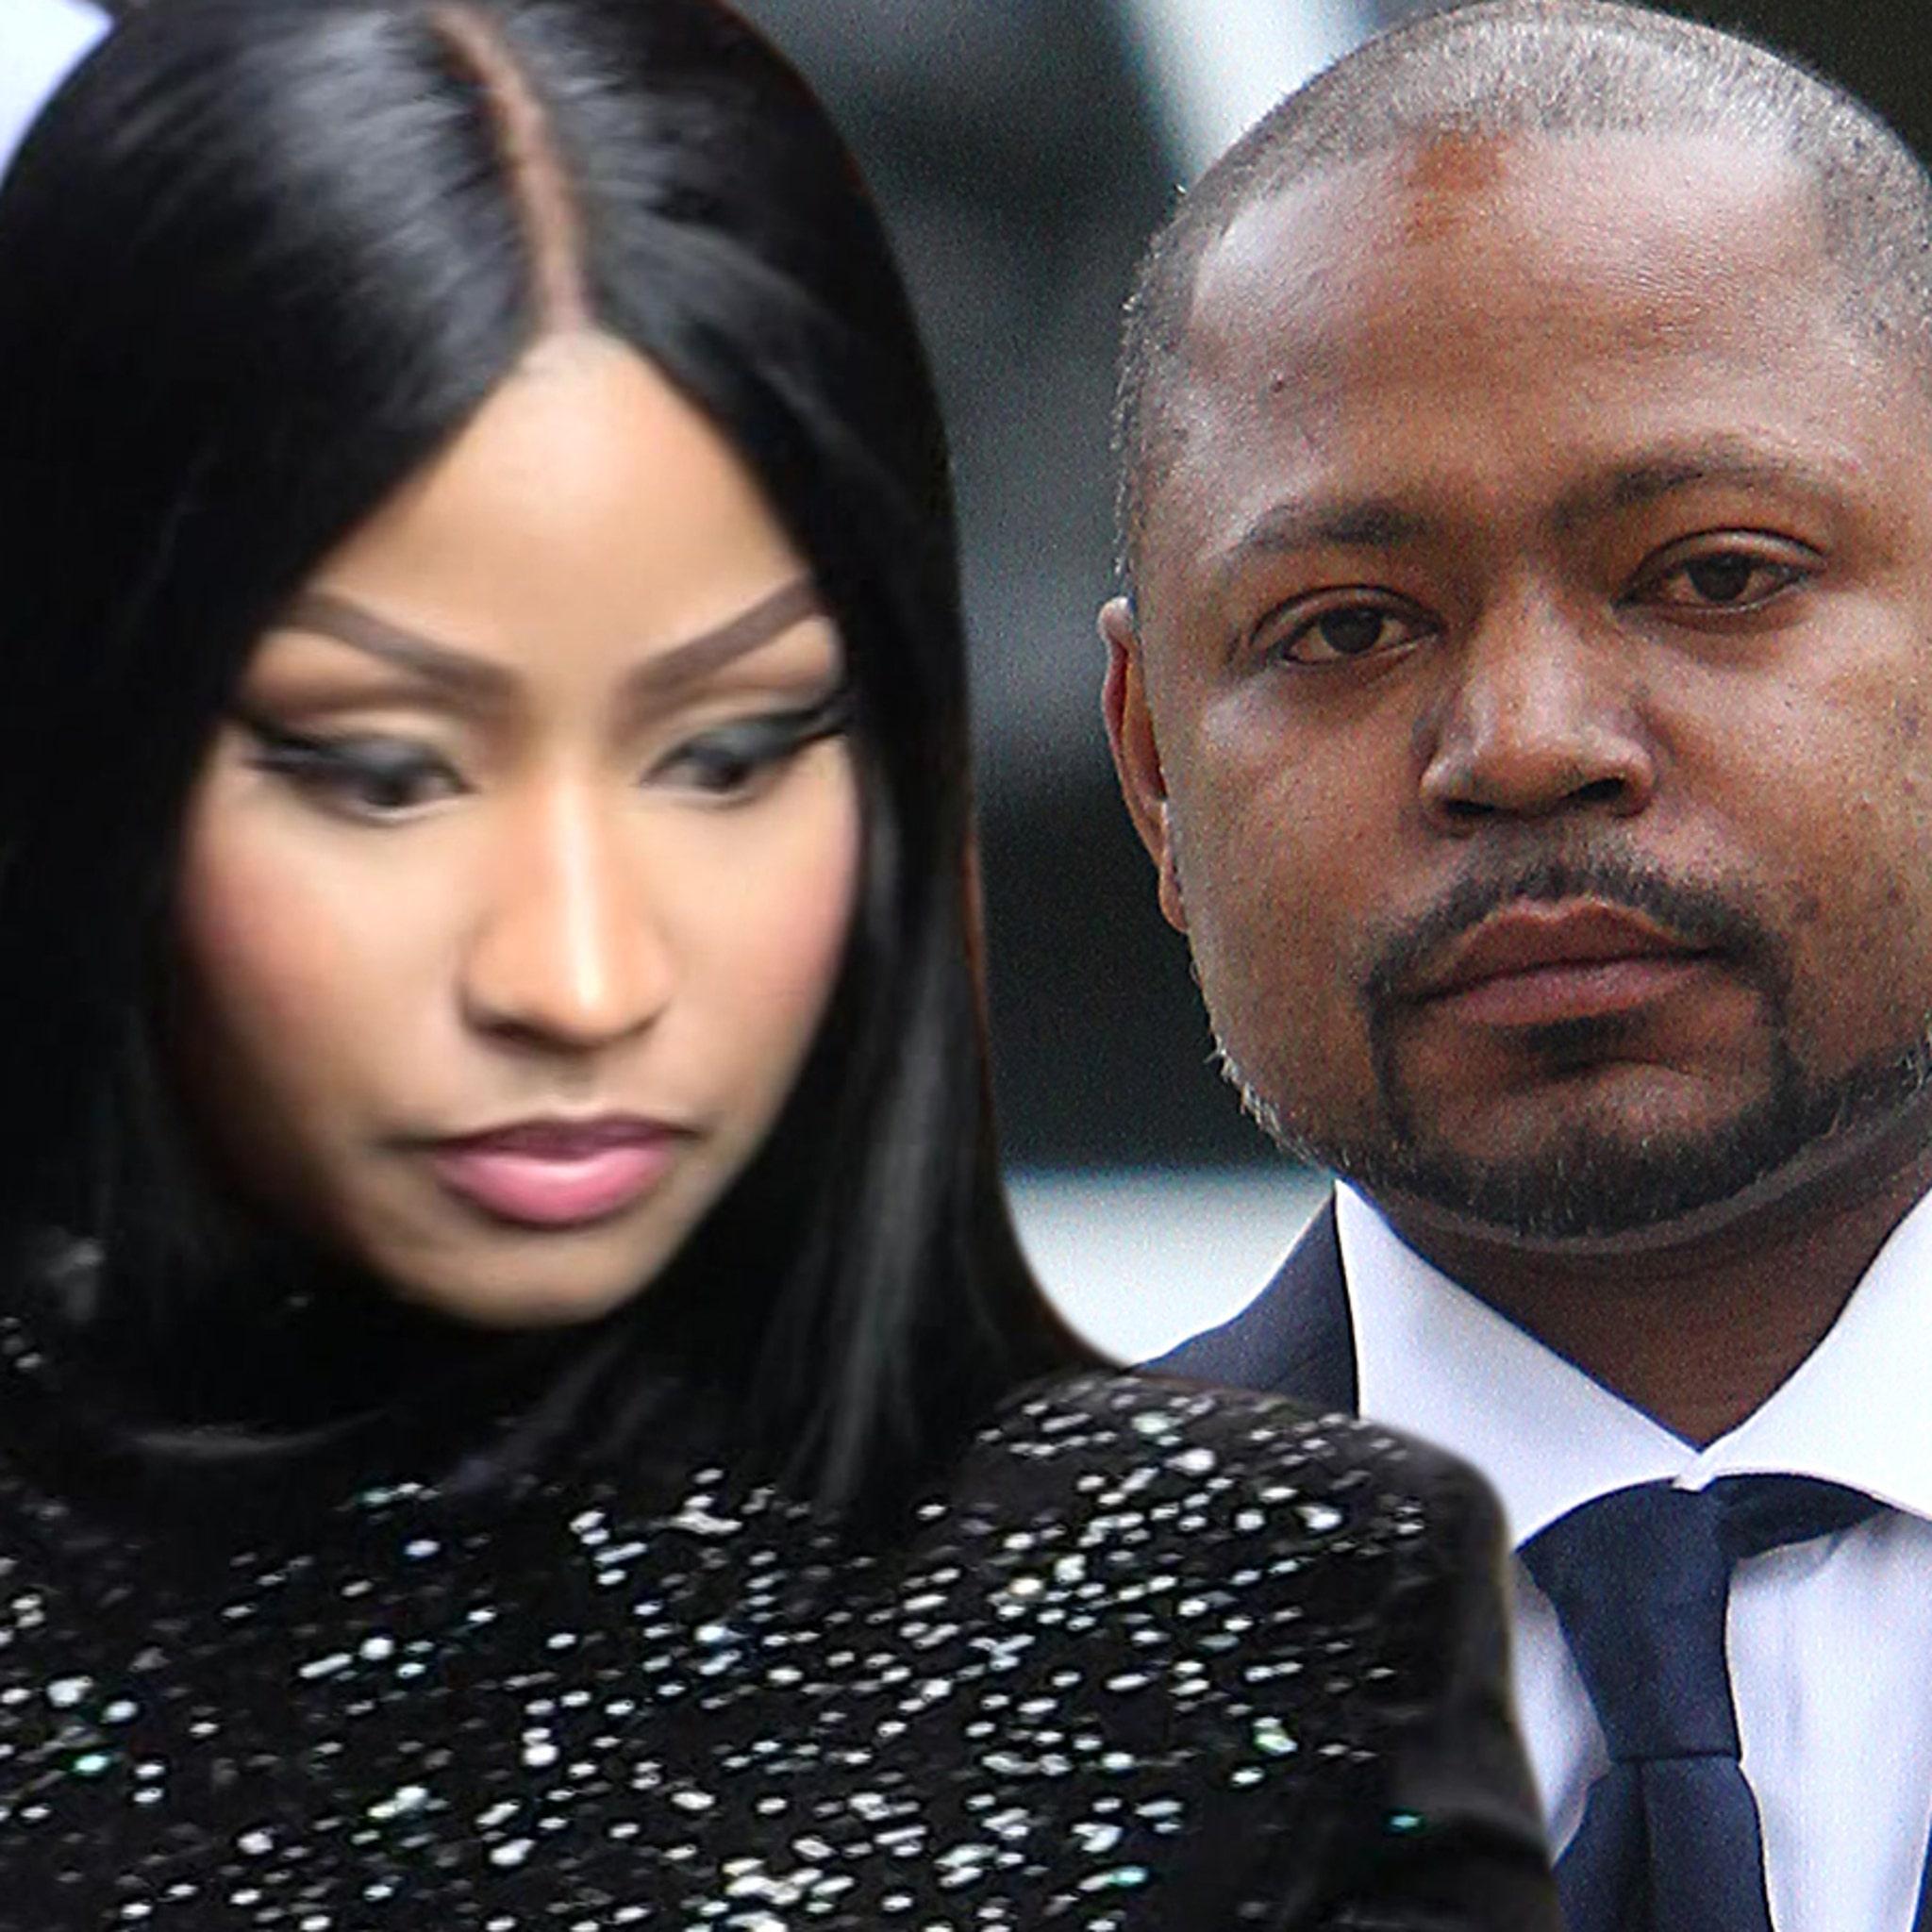 Nicki Minaj's Brother Sentenced to 25 Years to Life for Child Rape